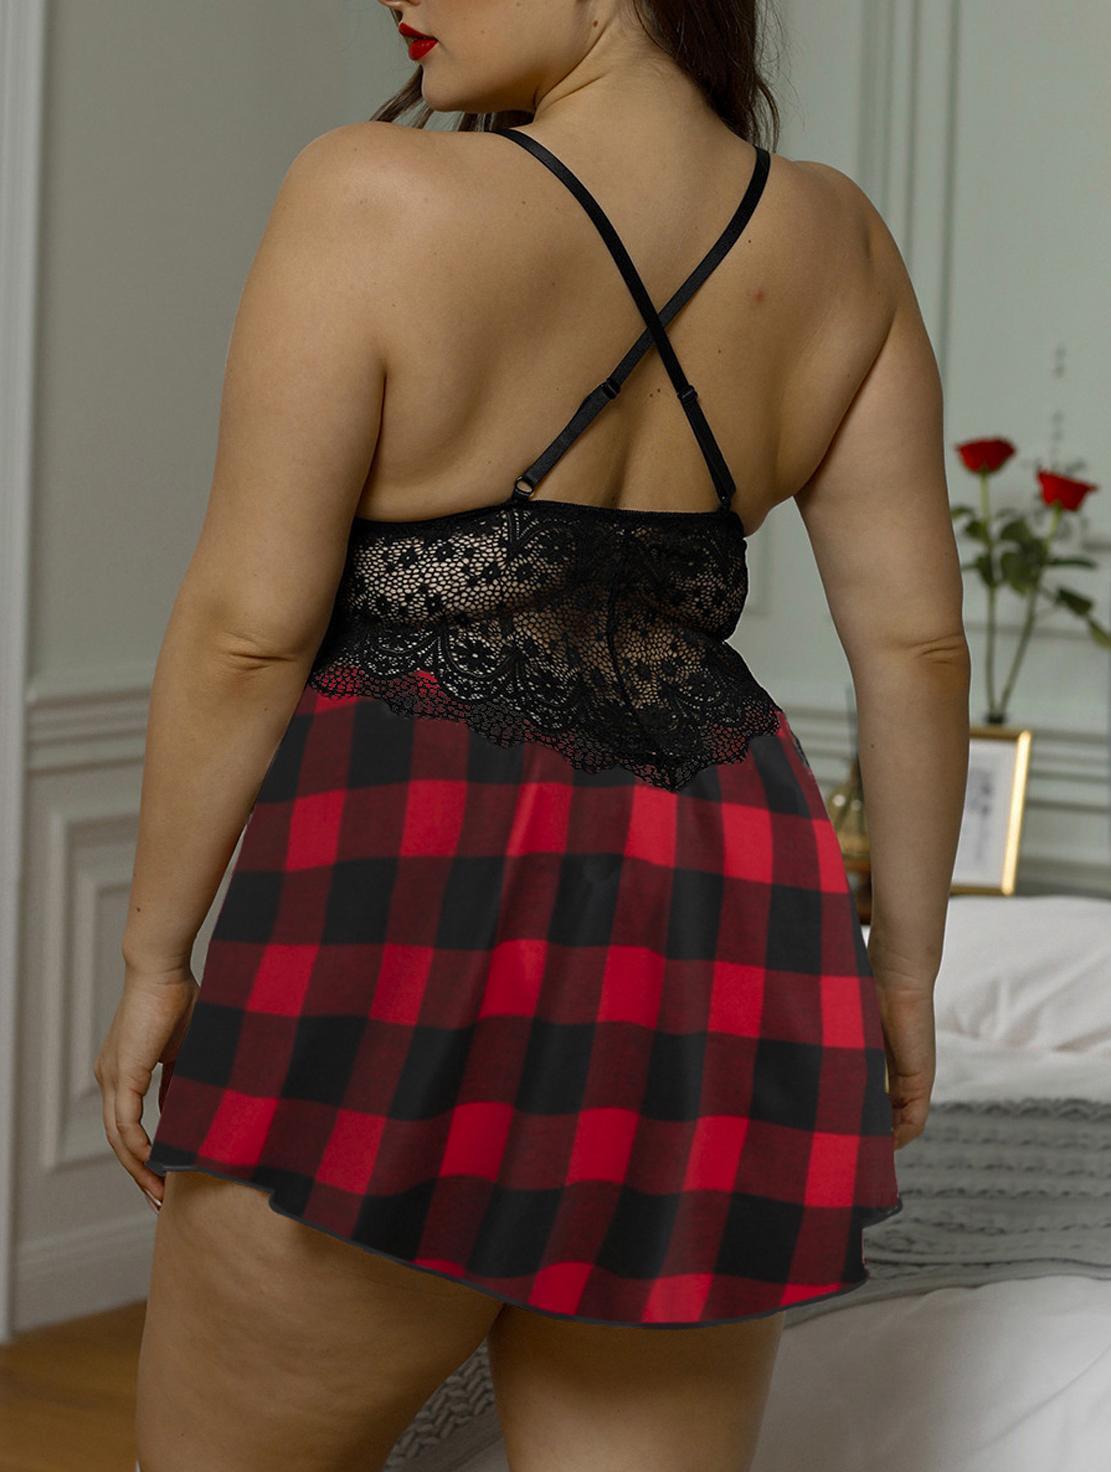 Women Plus Size Babydoll Teddy Lingerie Lace Bra Floral Chemise Nighties V-Neck Sleeveless Backless Nightdress Nightwear One Piece Pajama